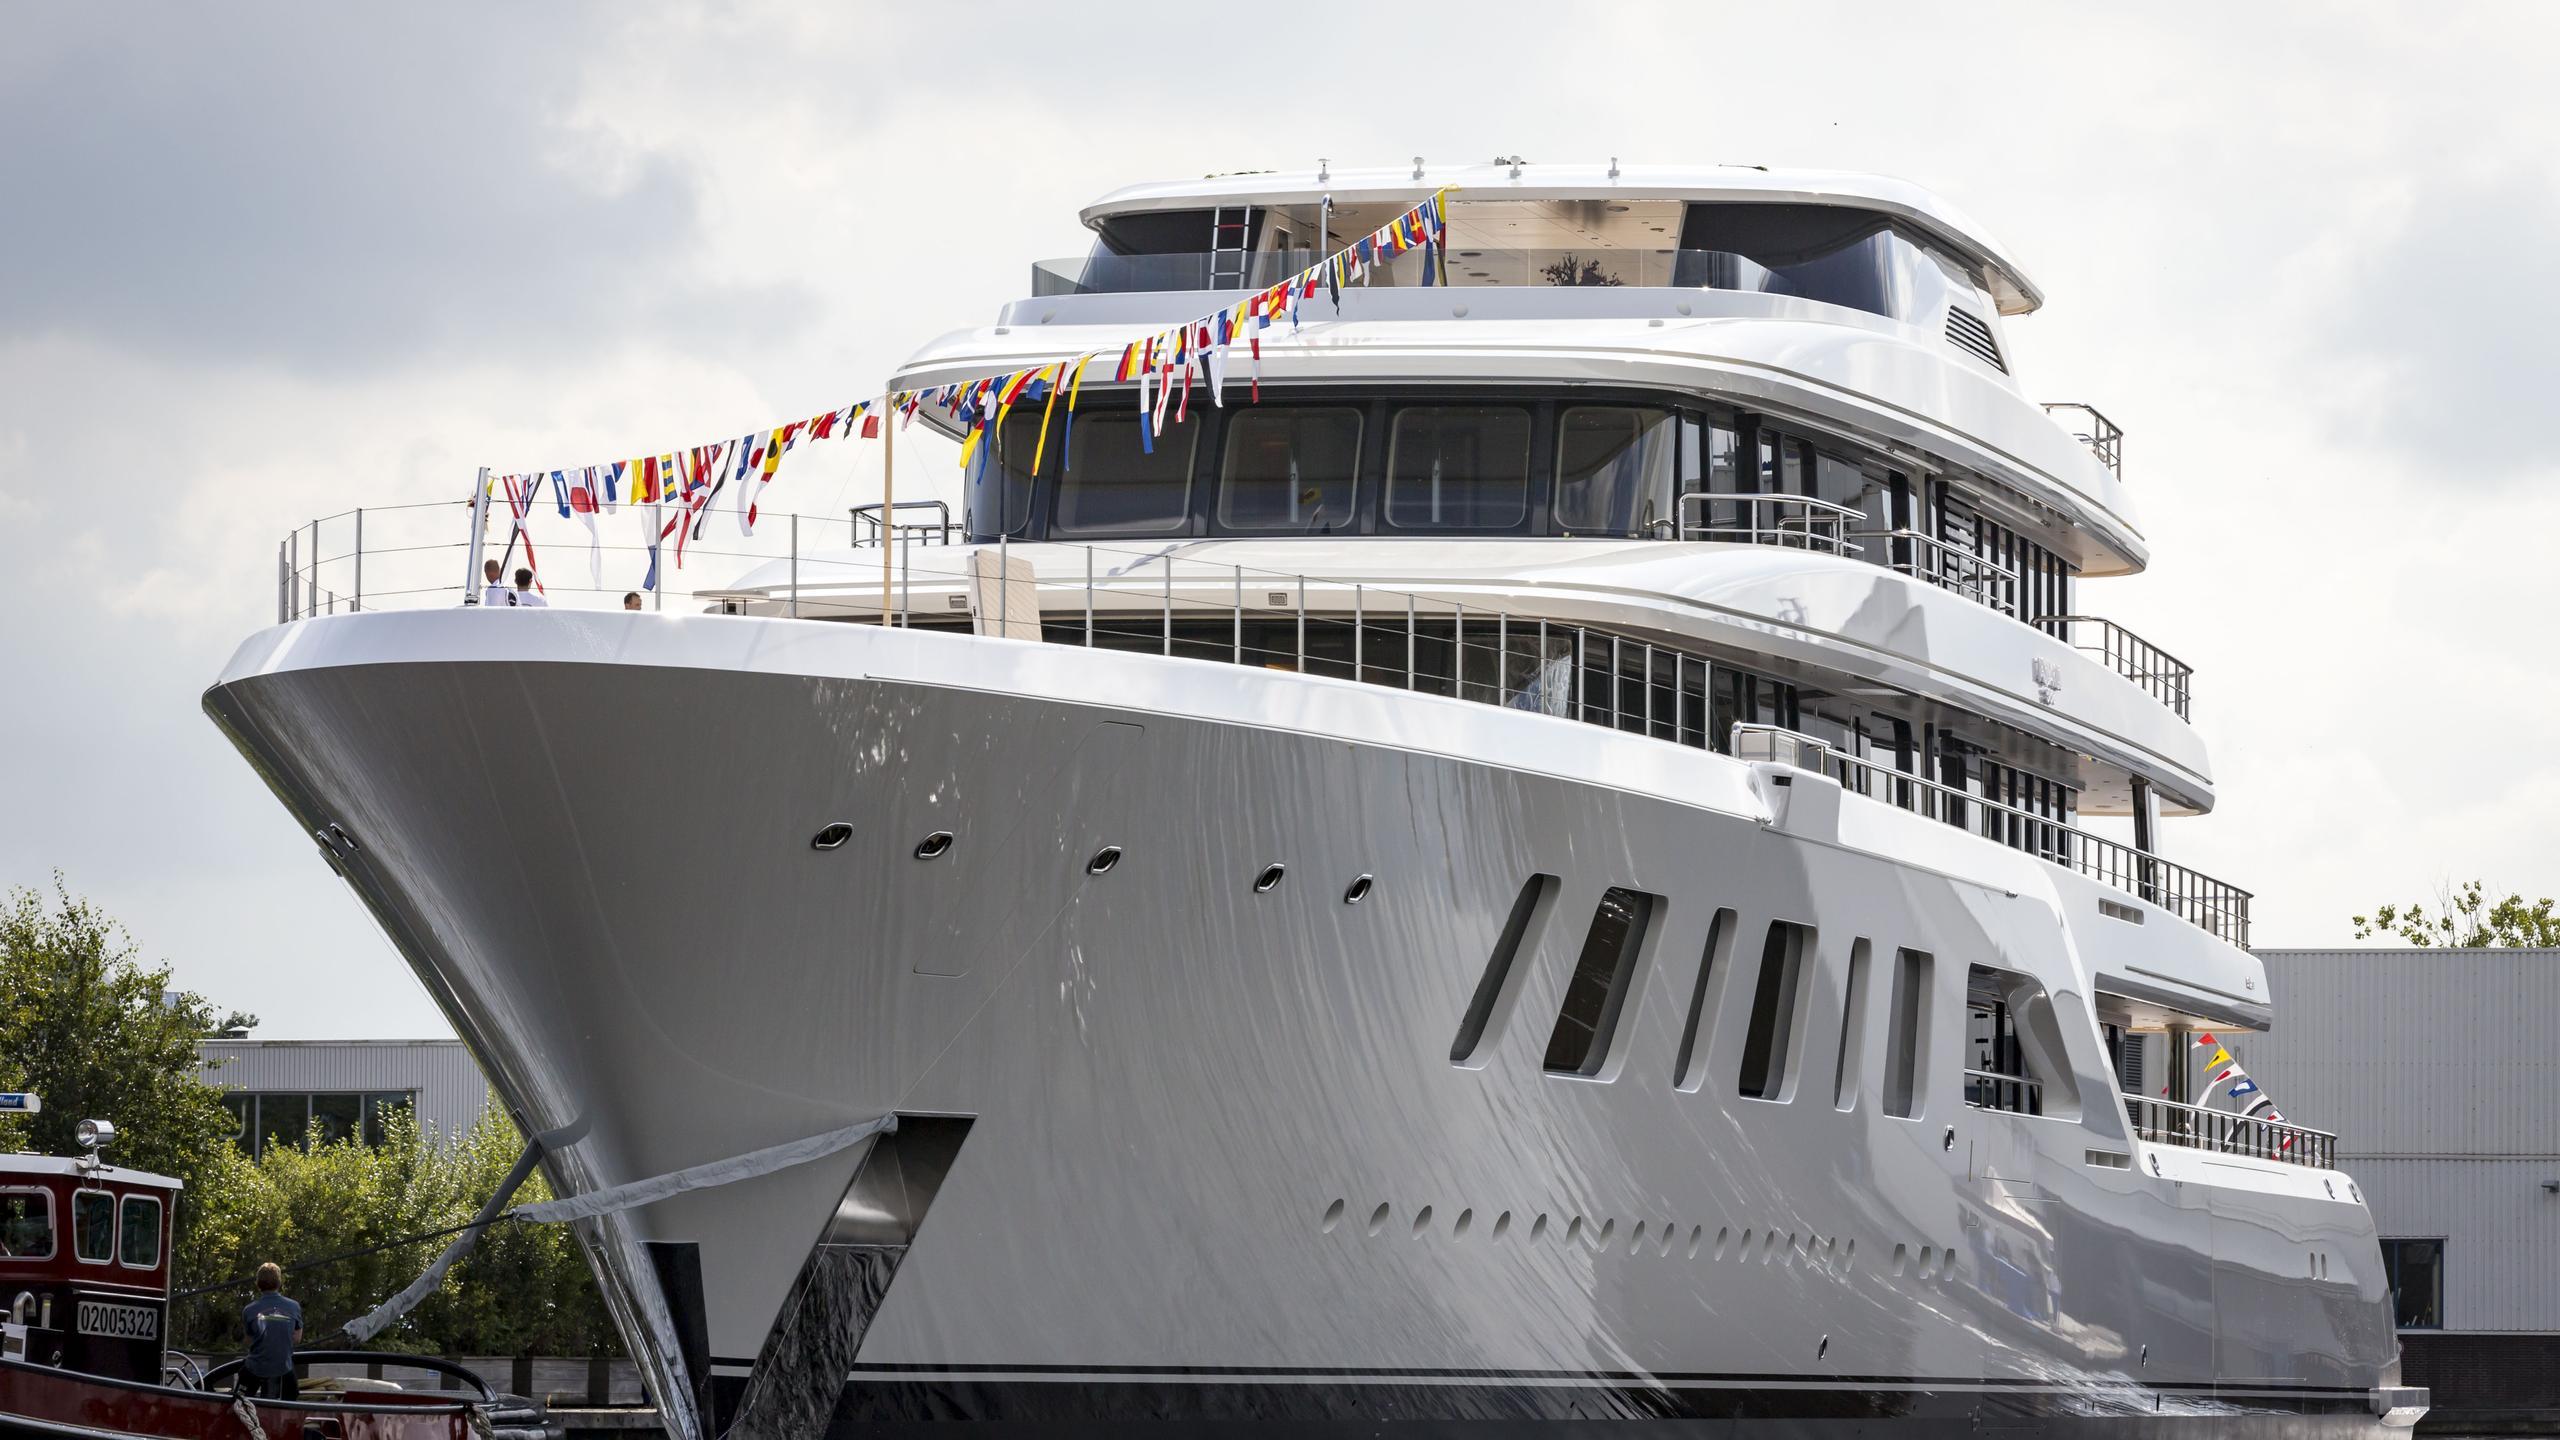 aquarius motoryacht feadship 2016 92m bow launch